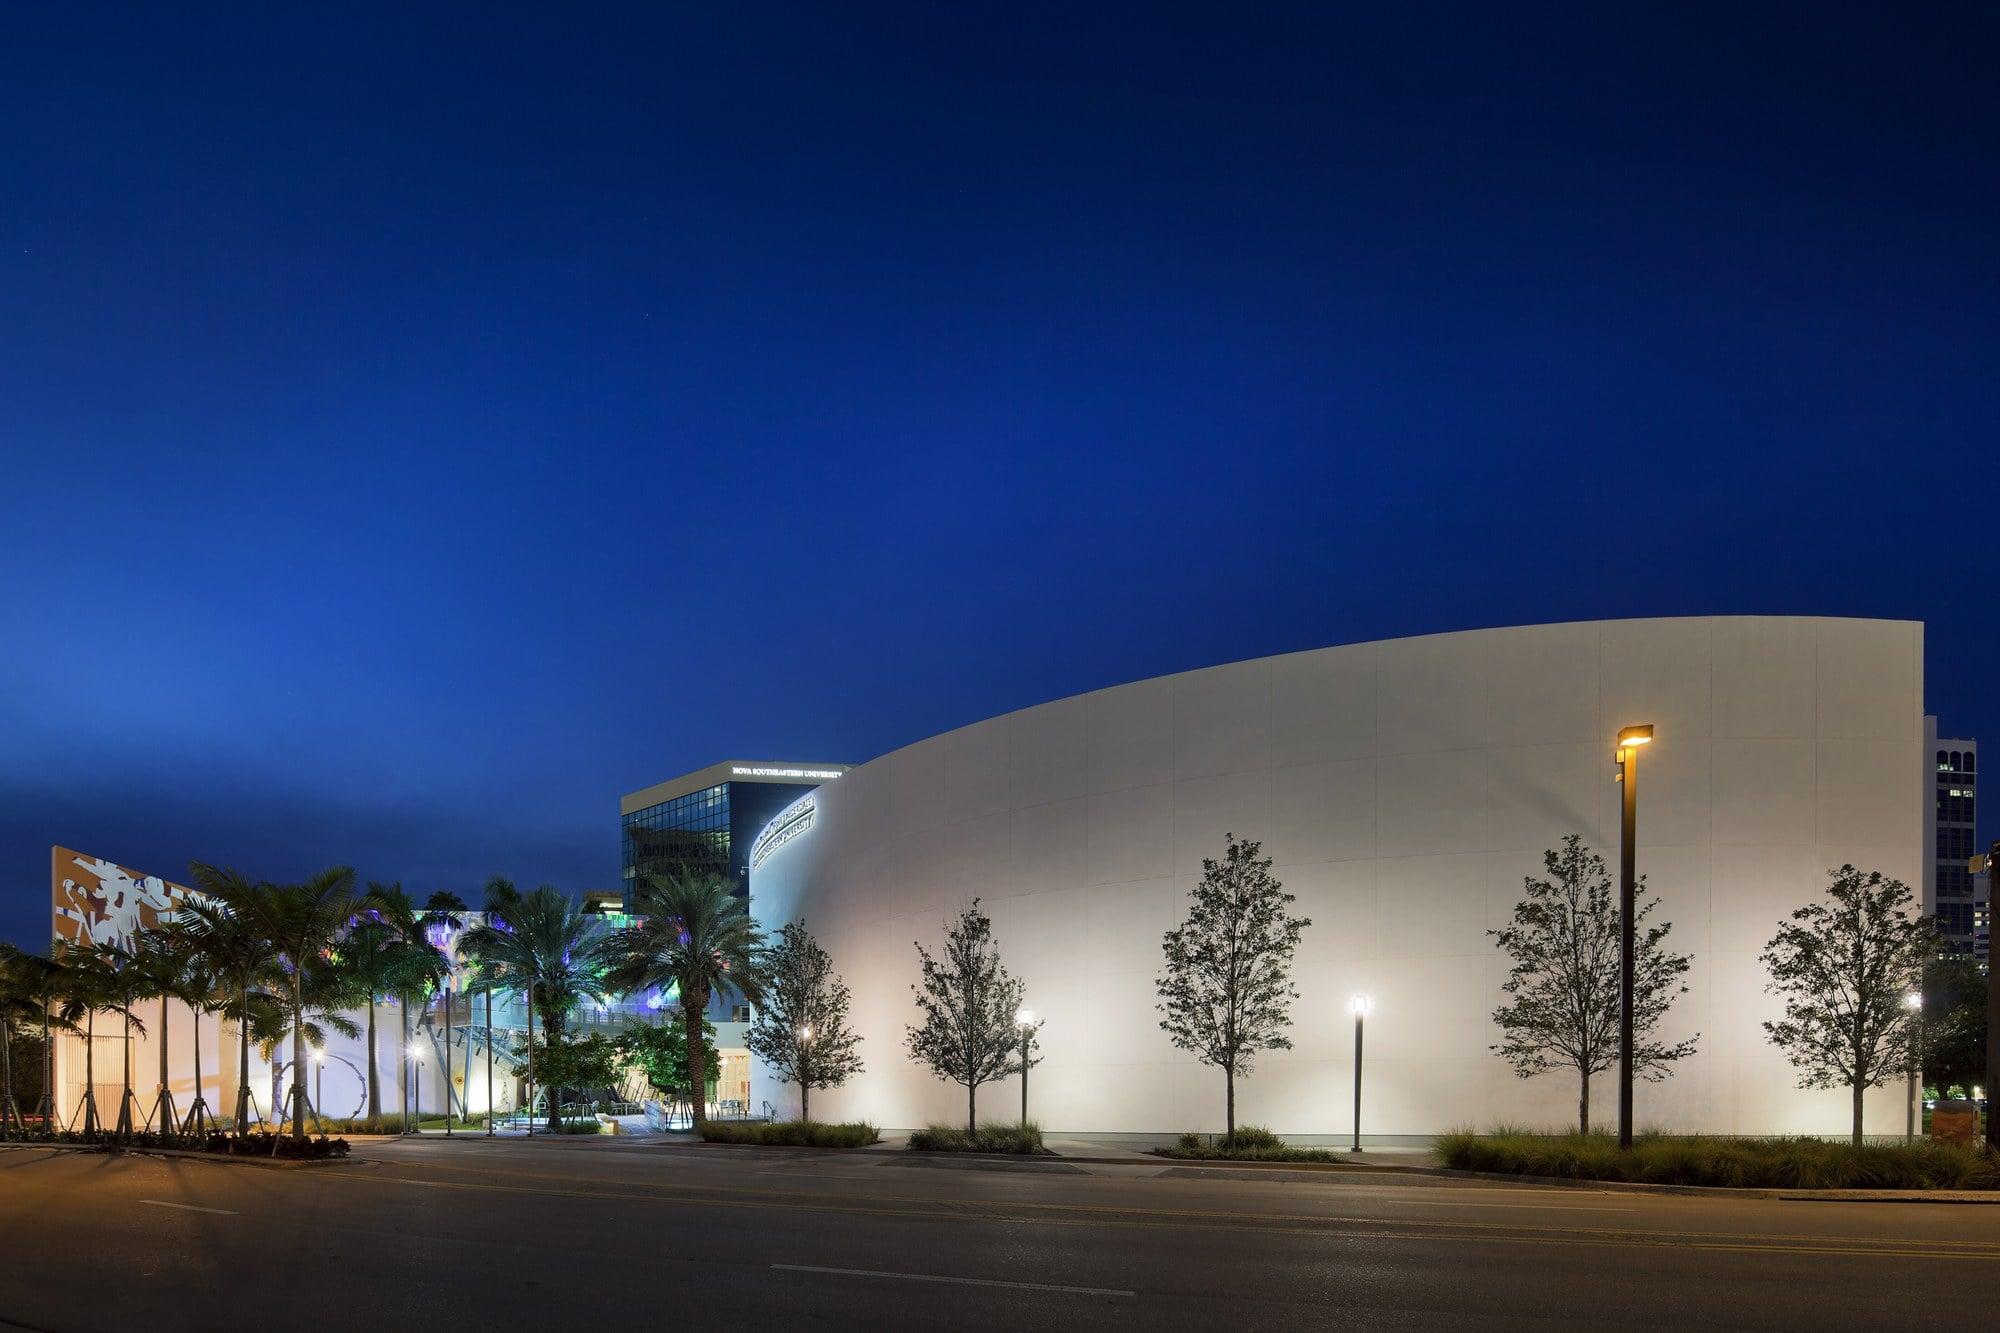 The NSU Art Gallery lit up at night ~ Fort Lauderdale Art Scene